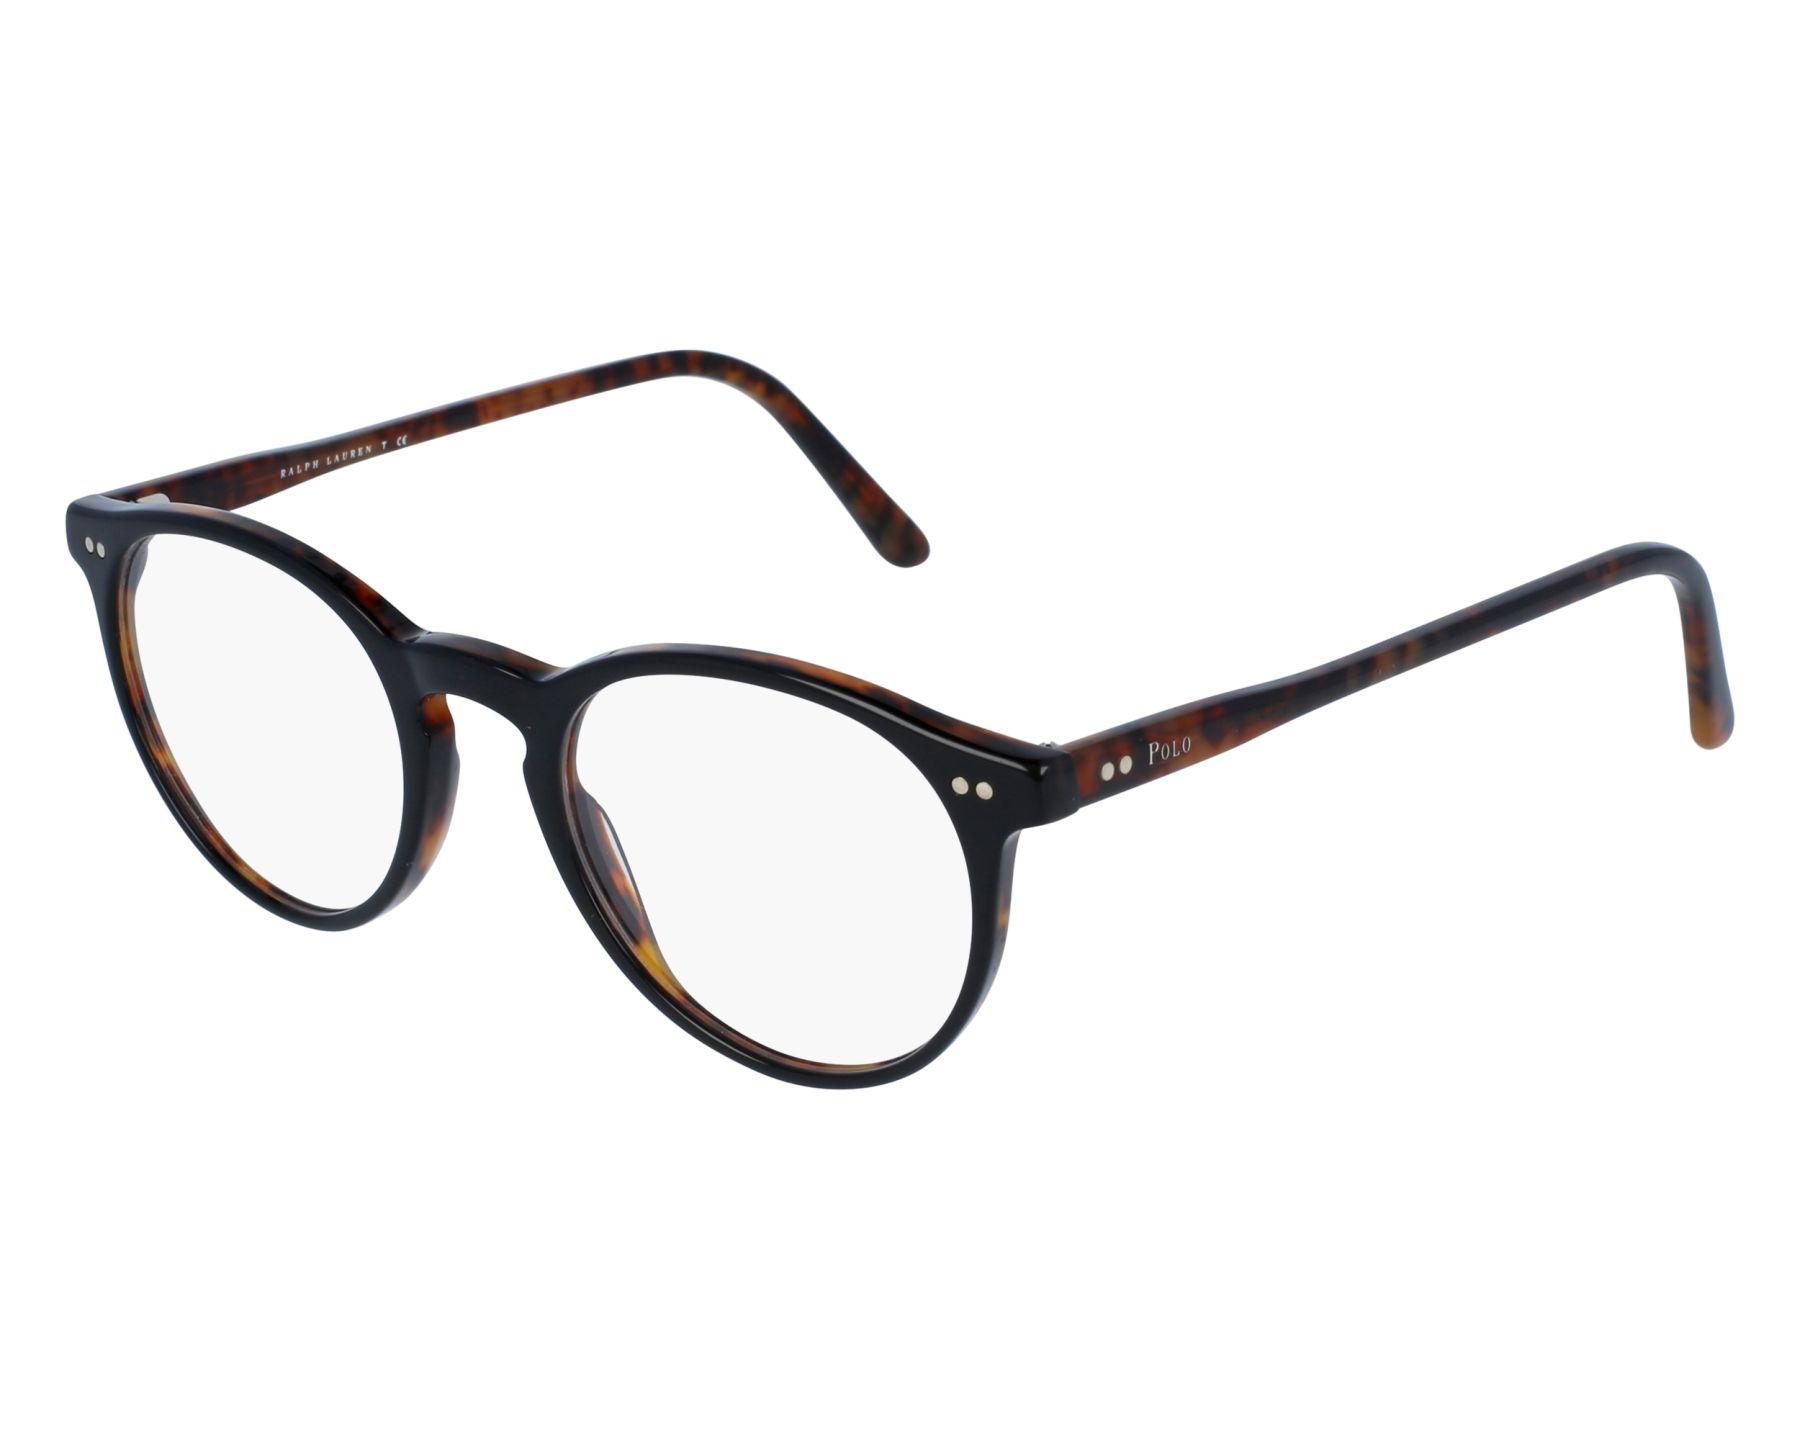 POLO RALPH LAUREN Eyeglasses POLO-2083. NEW & AUTHENTIC! | eBay